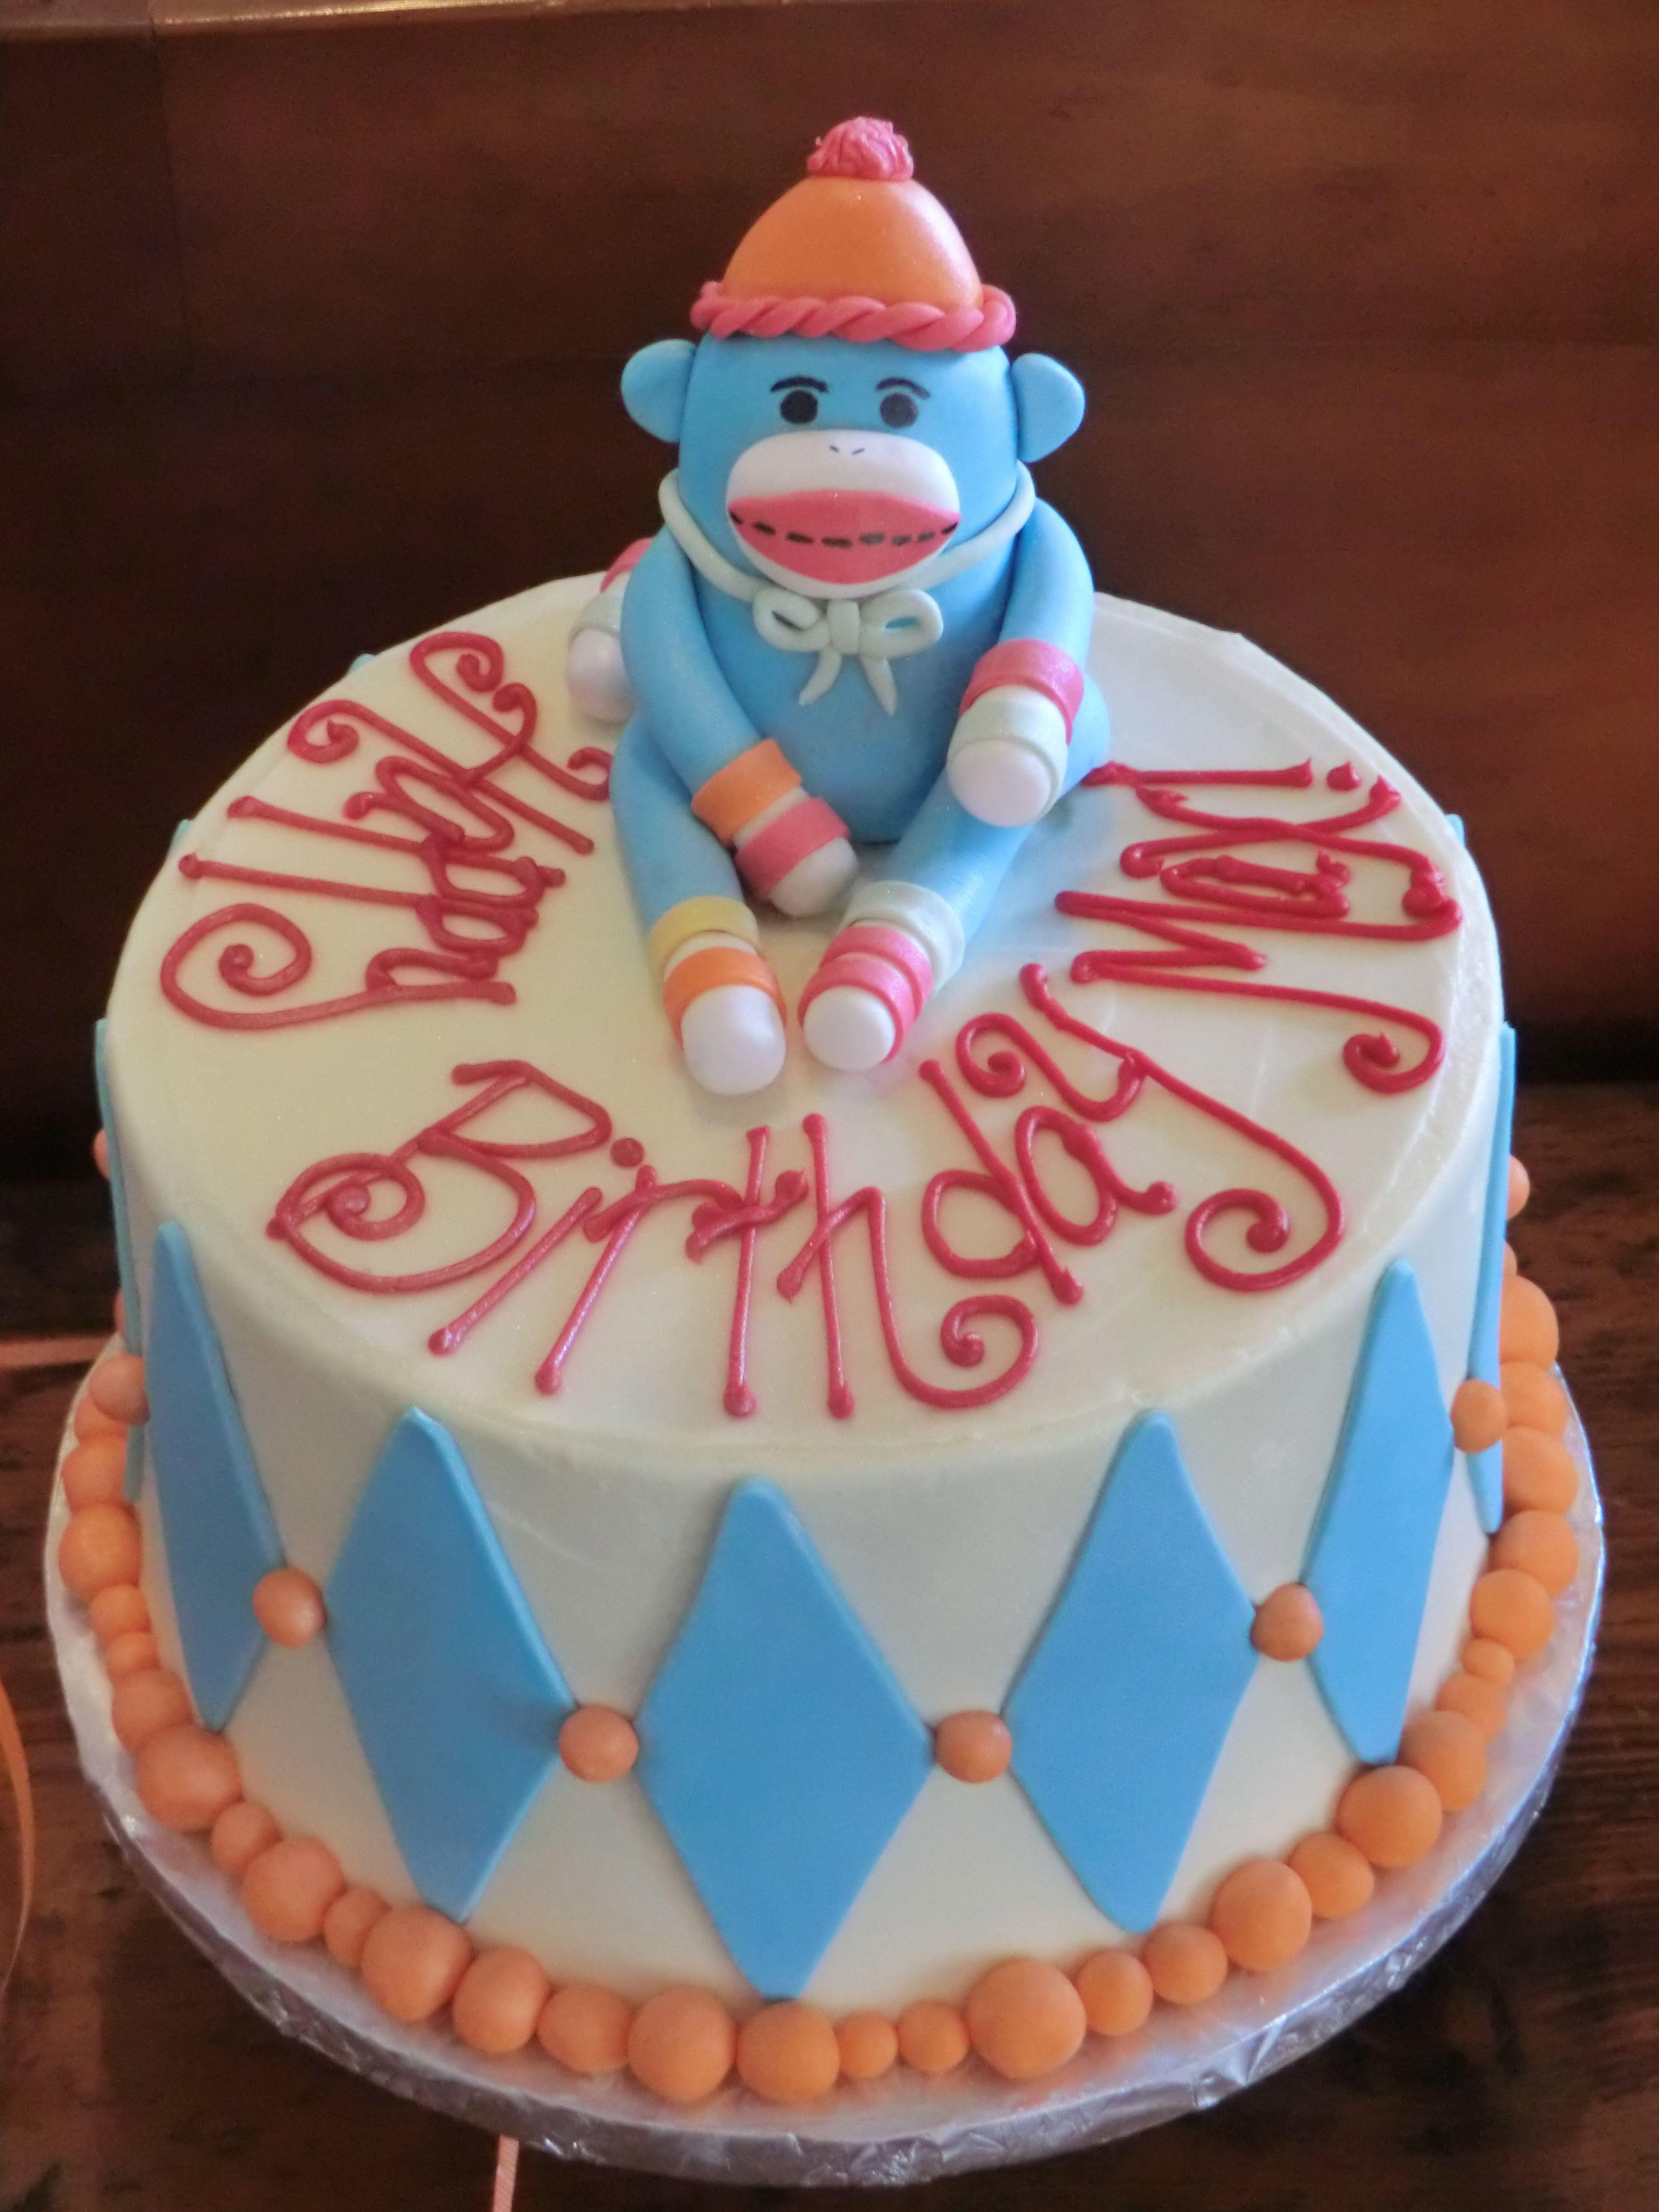 Sock monkey cake for boy | Cookie decorating, Cake ...